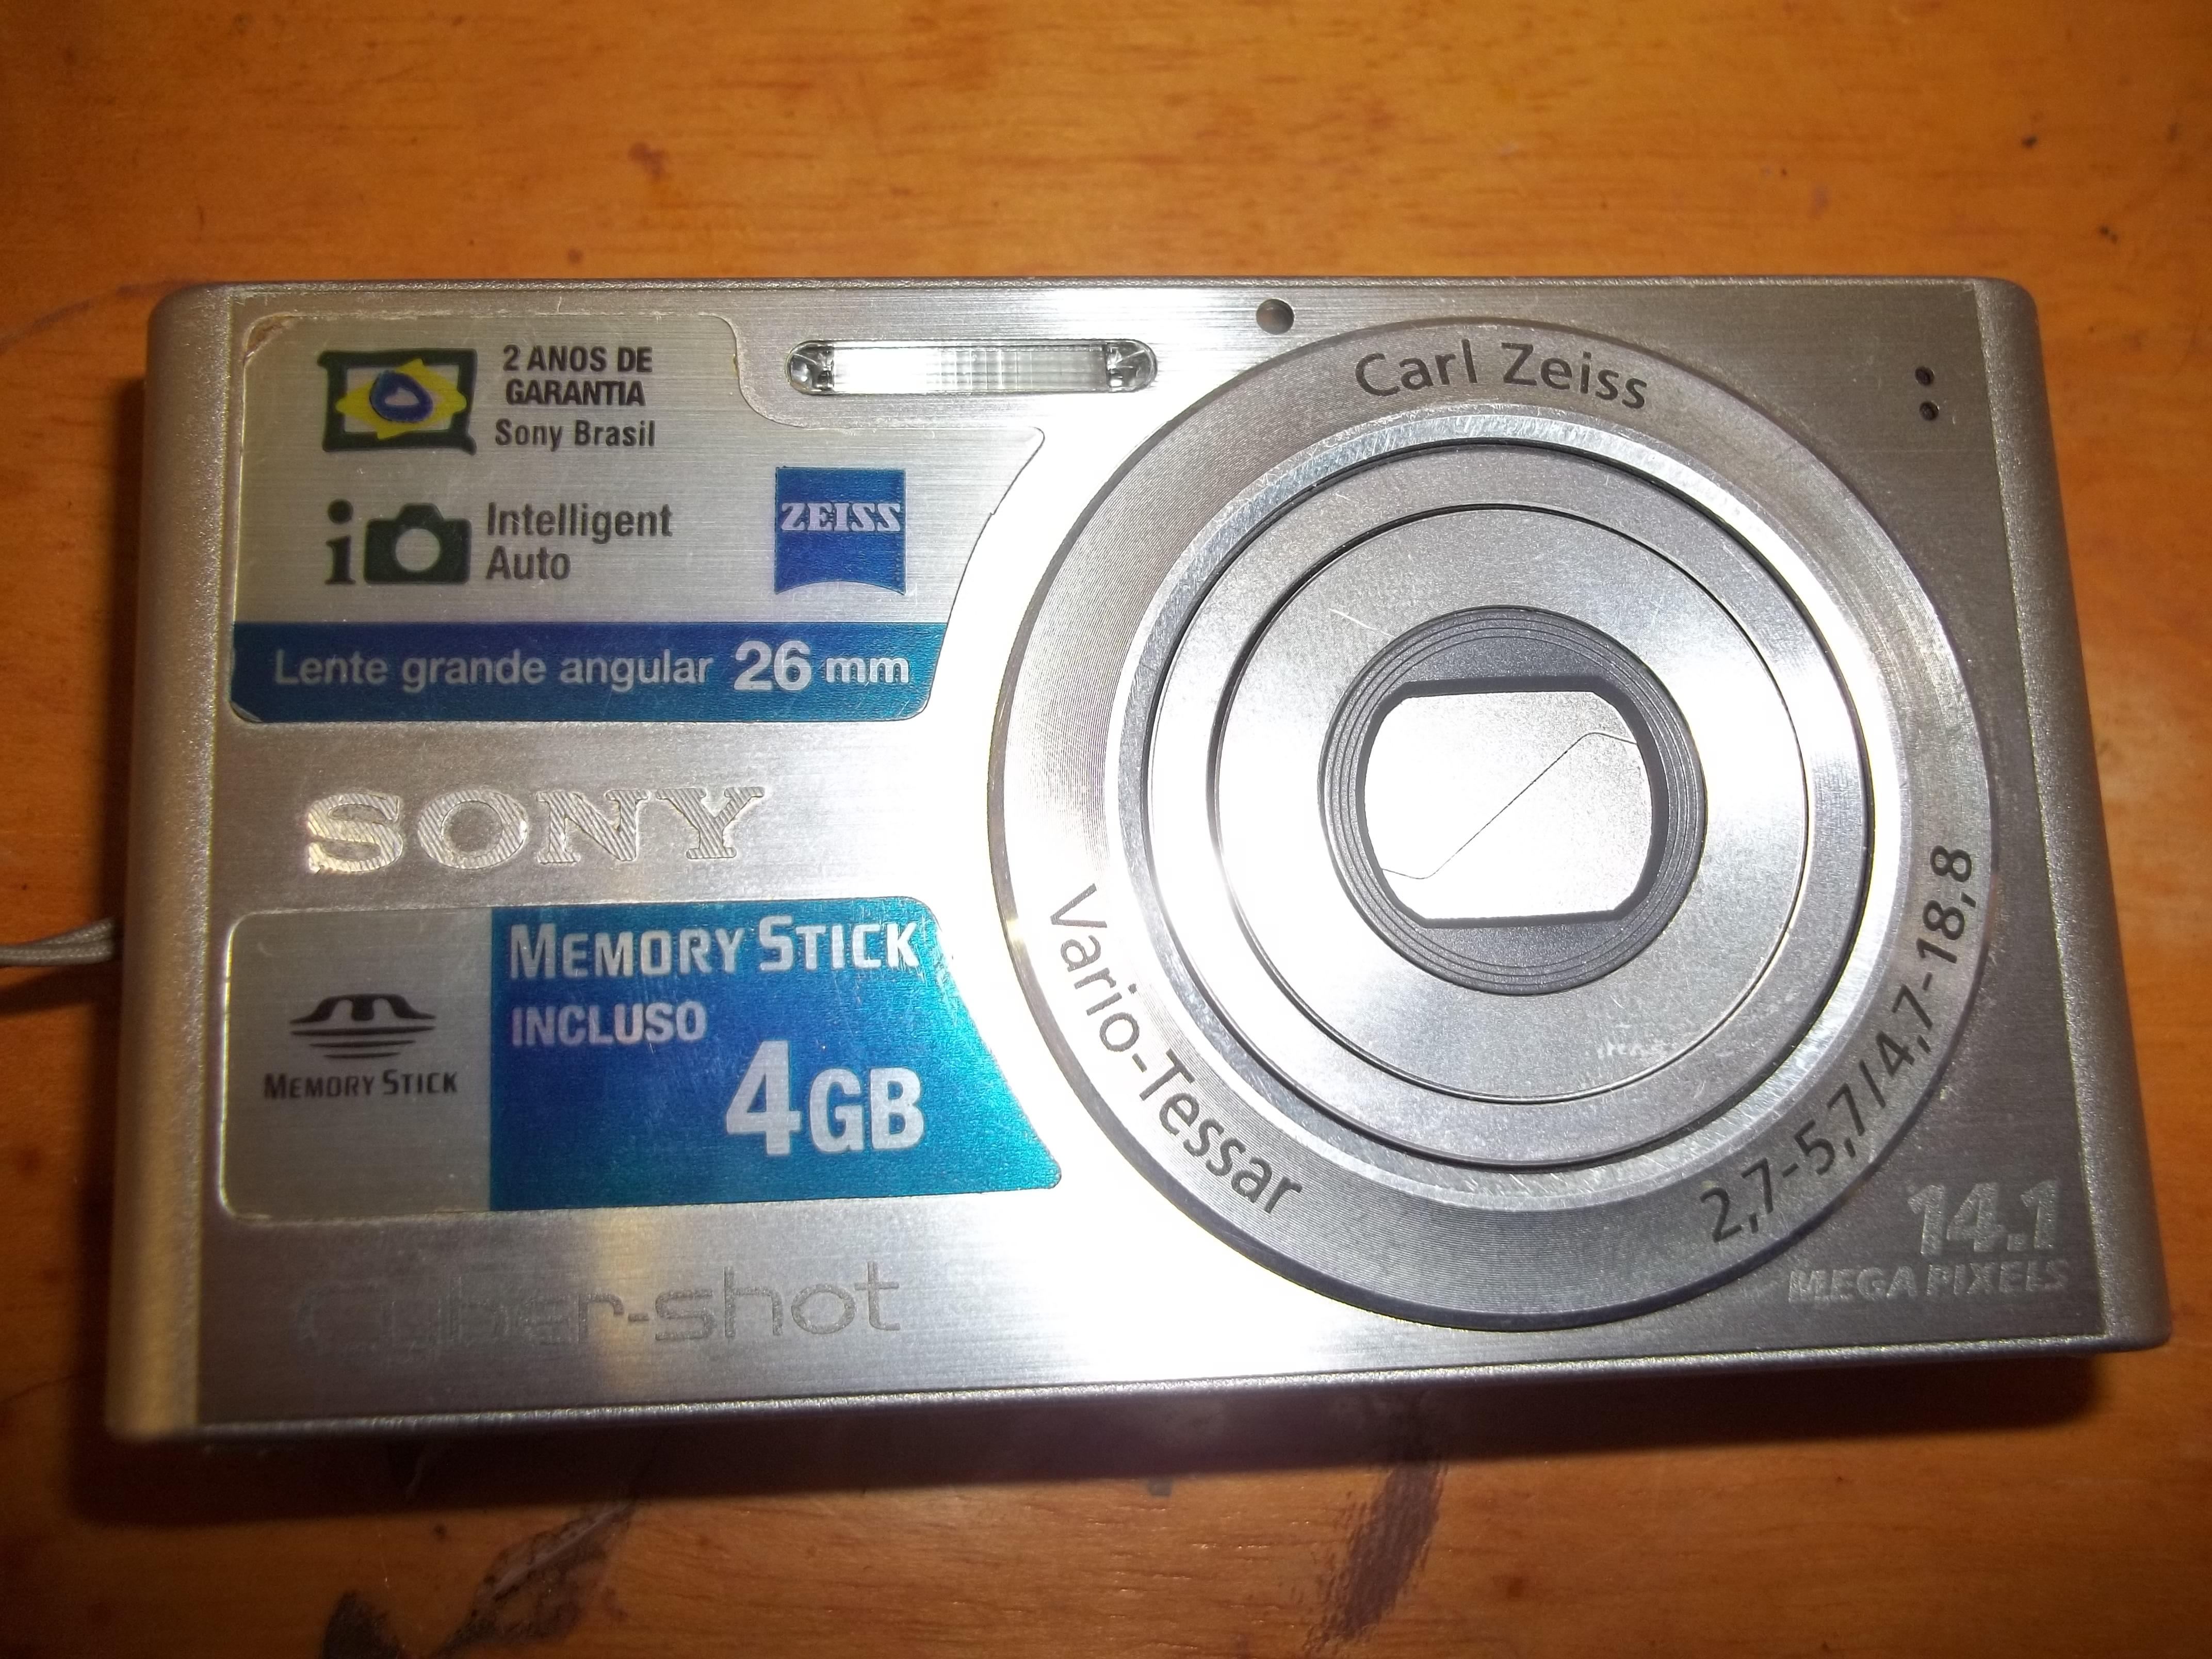 Câmera Digital Sony Cybershot DSC-320, Japão. Fotografada com Câmera Digital KODAK C-183.